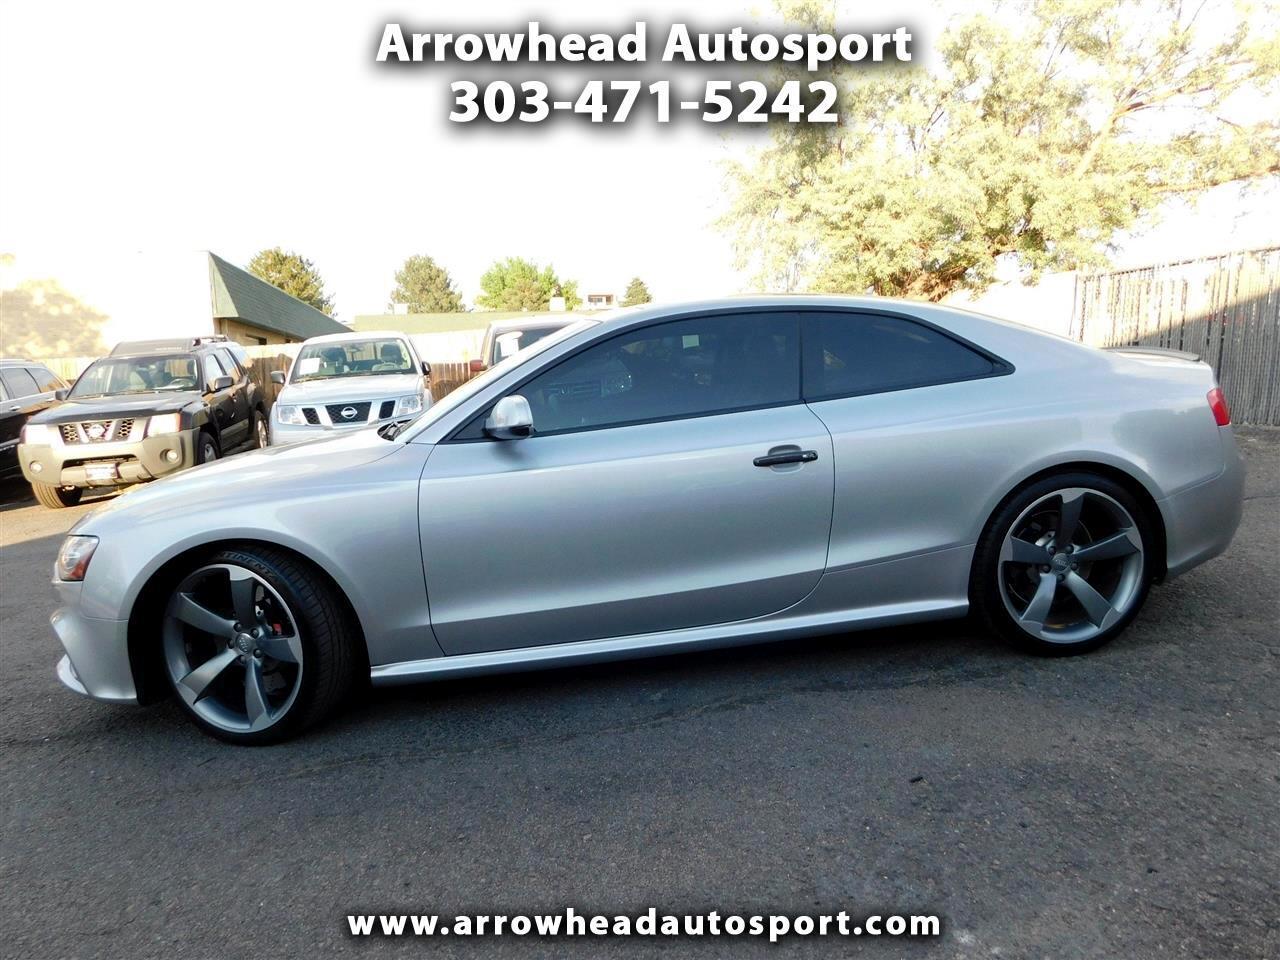 2013 Audi RS 5 2dr Cpe